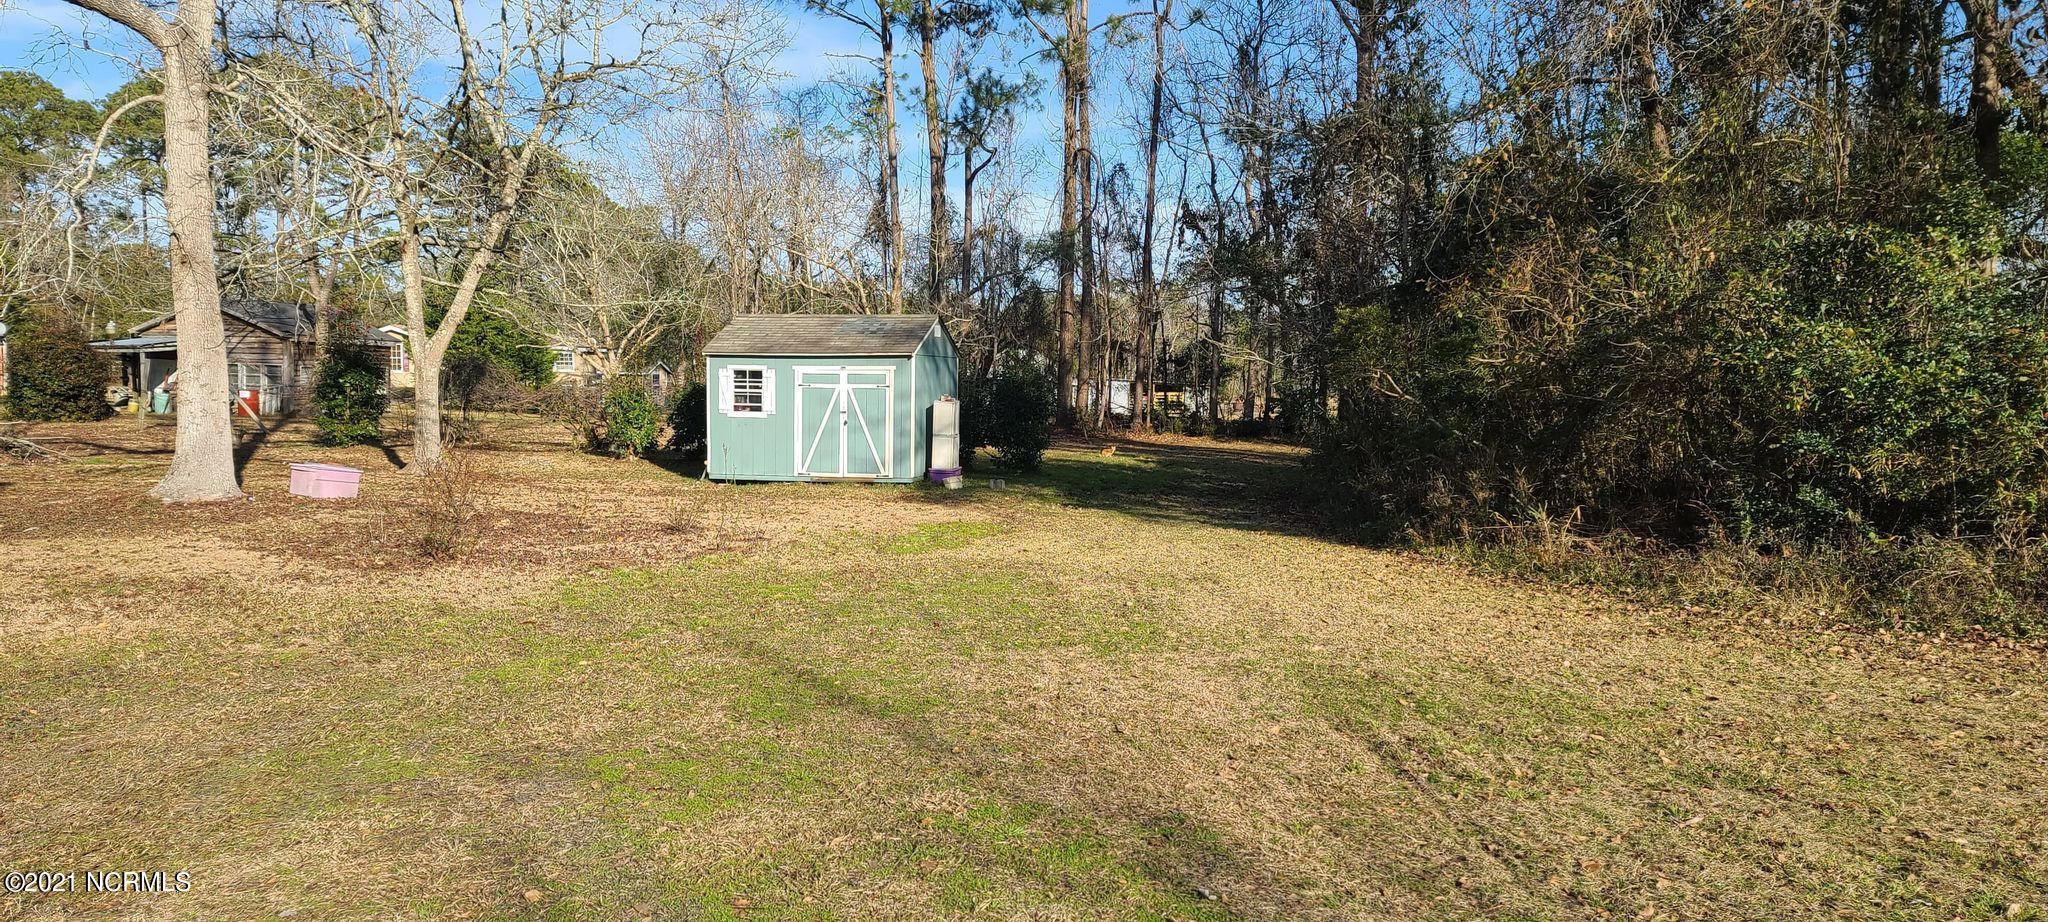 2575 Aberdeen Street, Supply, North Carolina 28462, ,Residential land,For sale,Aberdeen,100262919